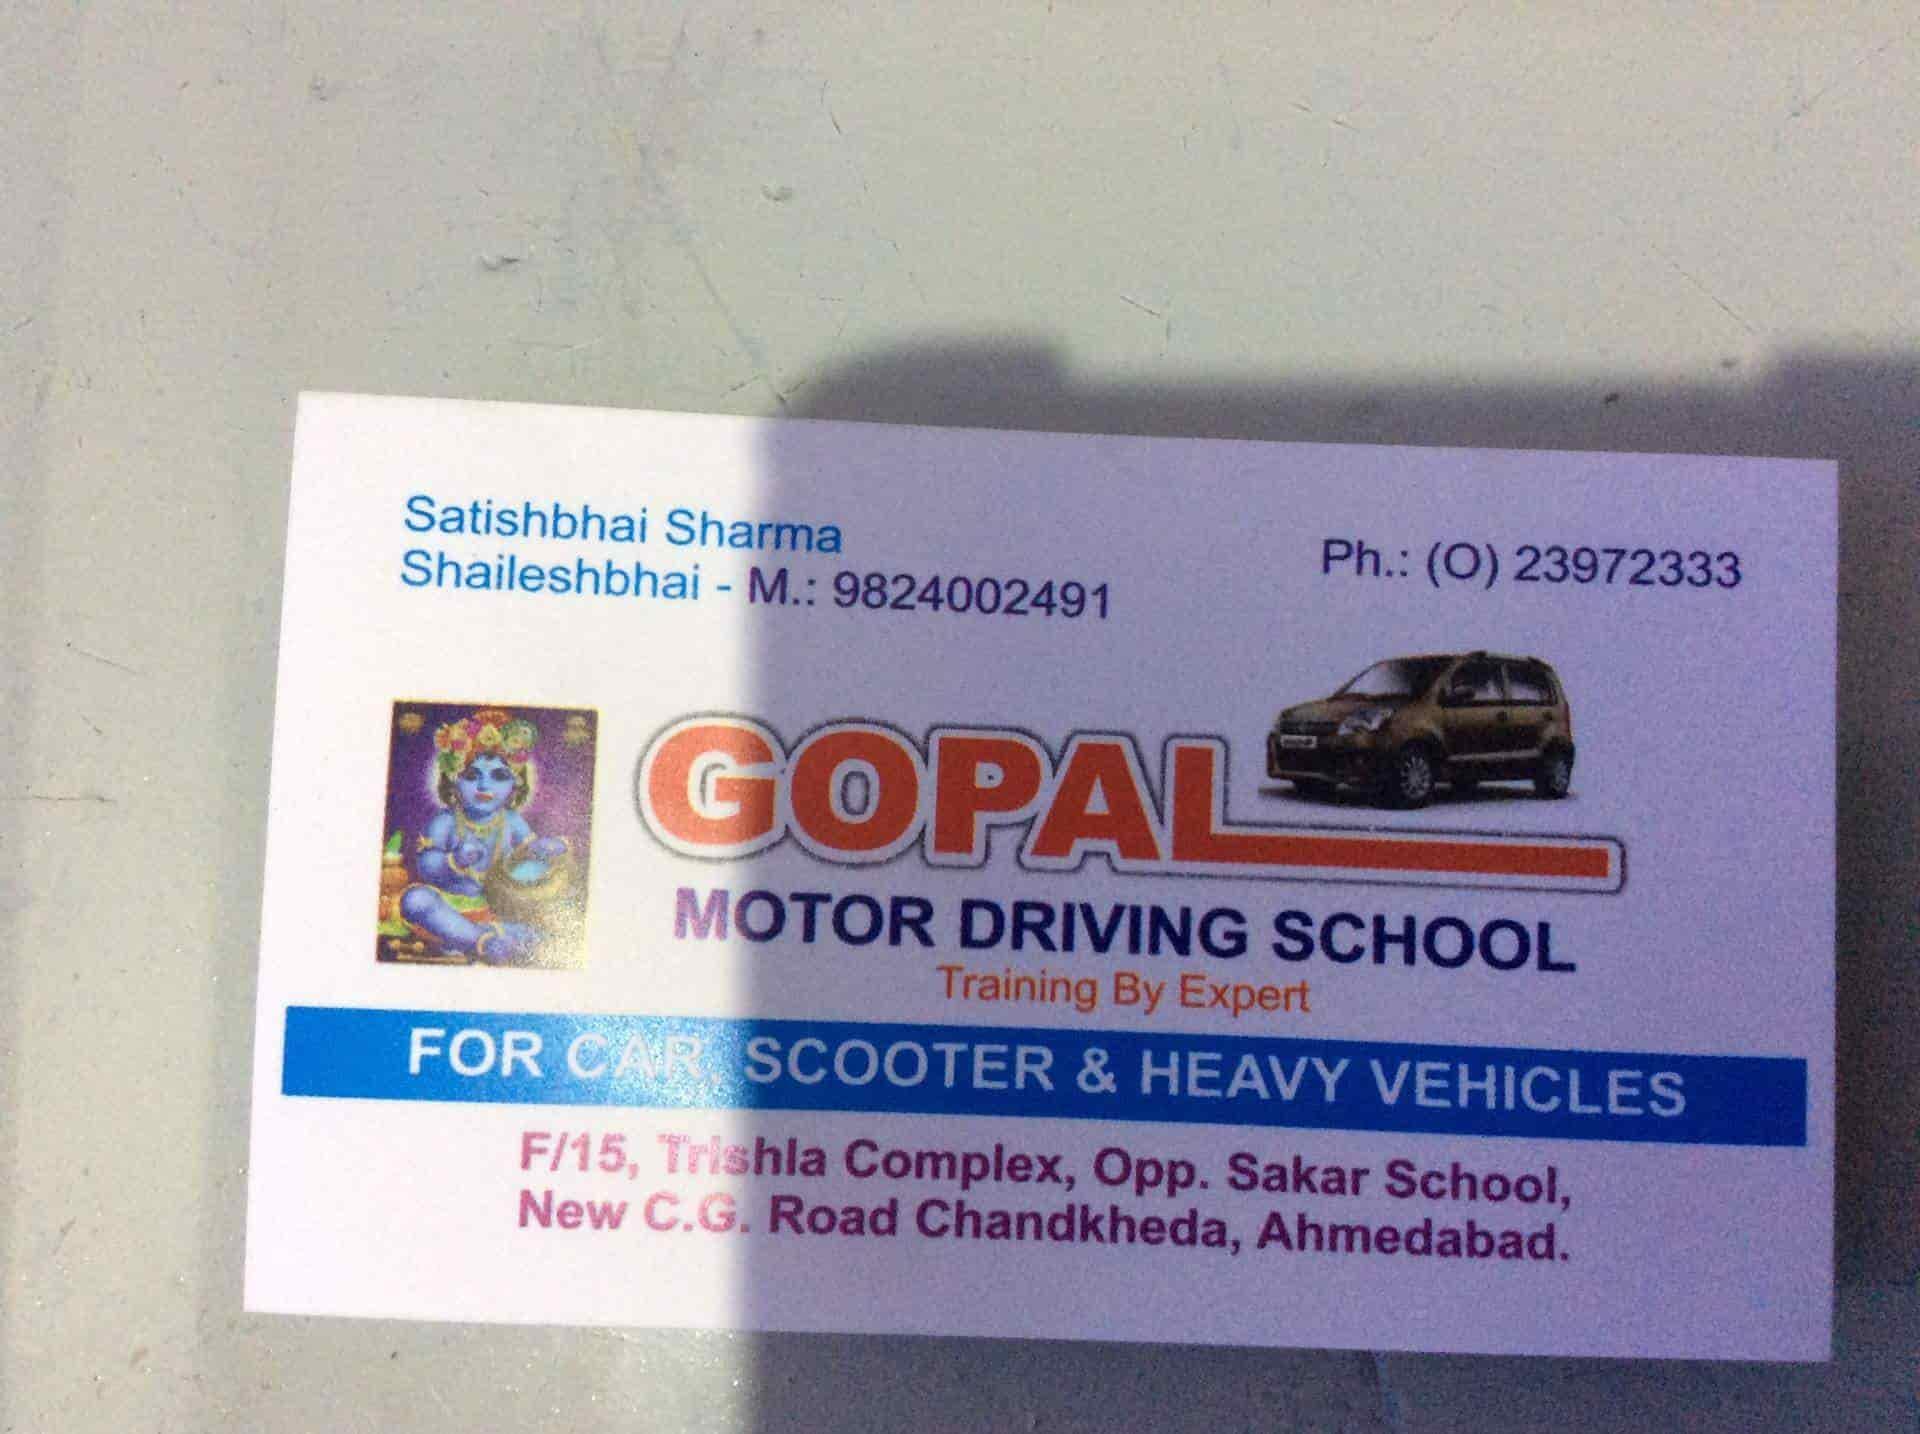 Gopal Motors Driving School Photos Chandkheda Ahmedabad Pictures